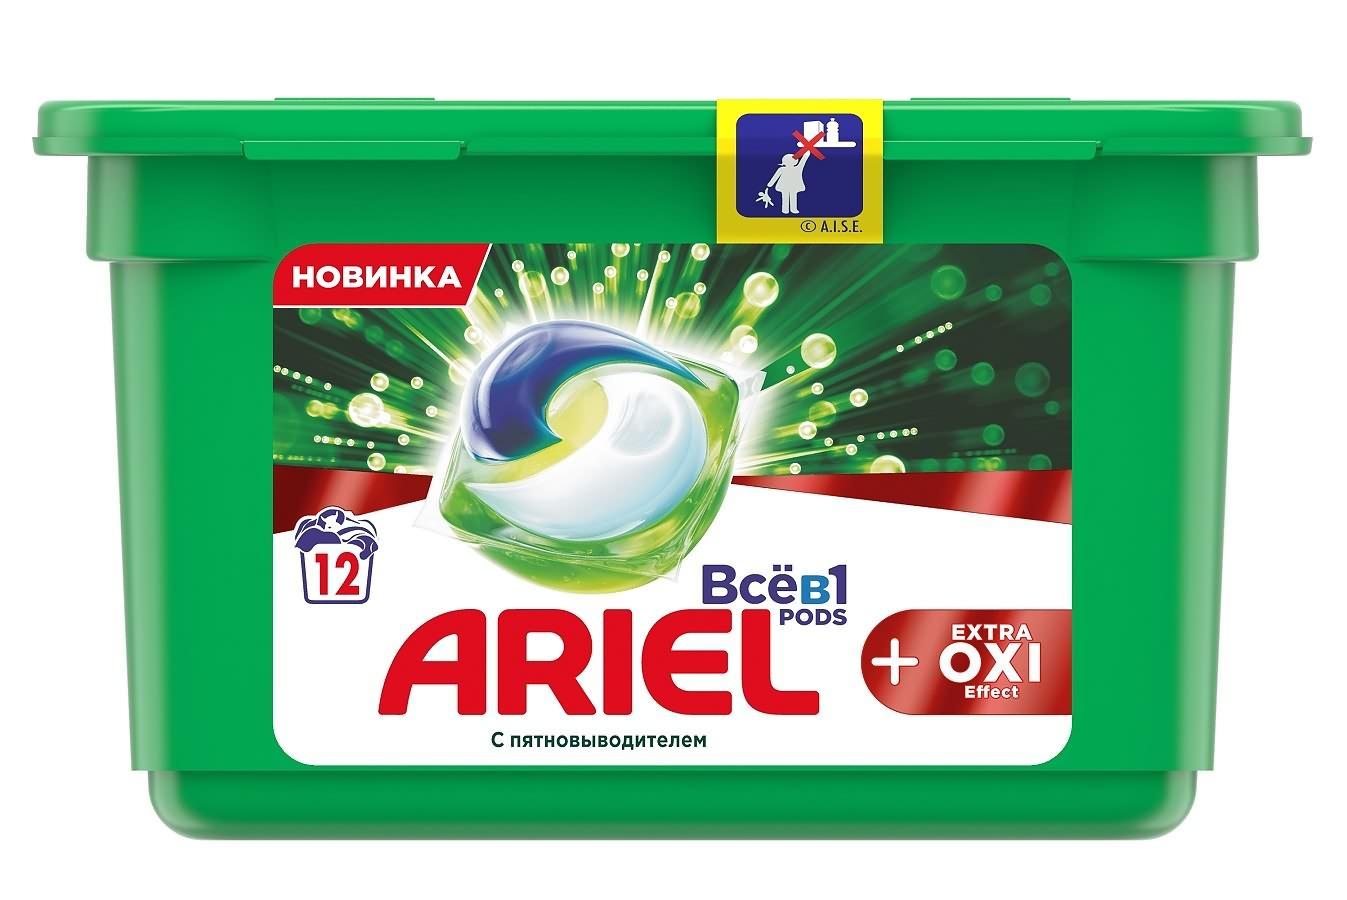 Ariel PODs_OXI_12